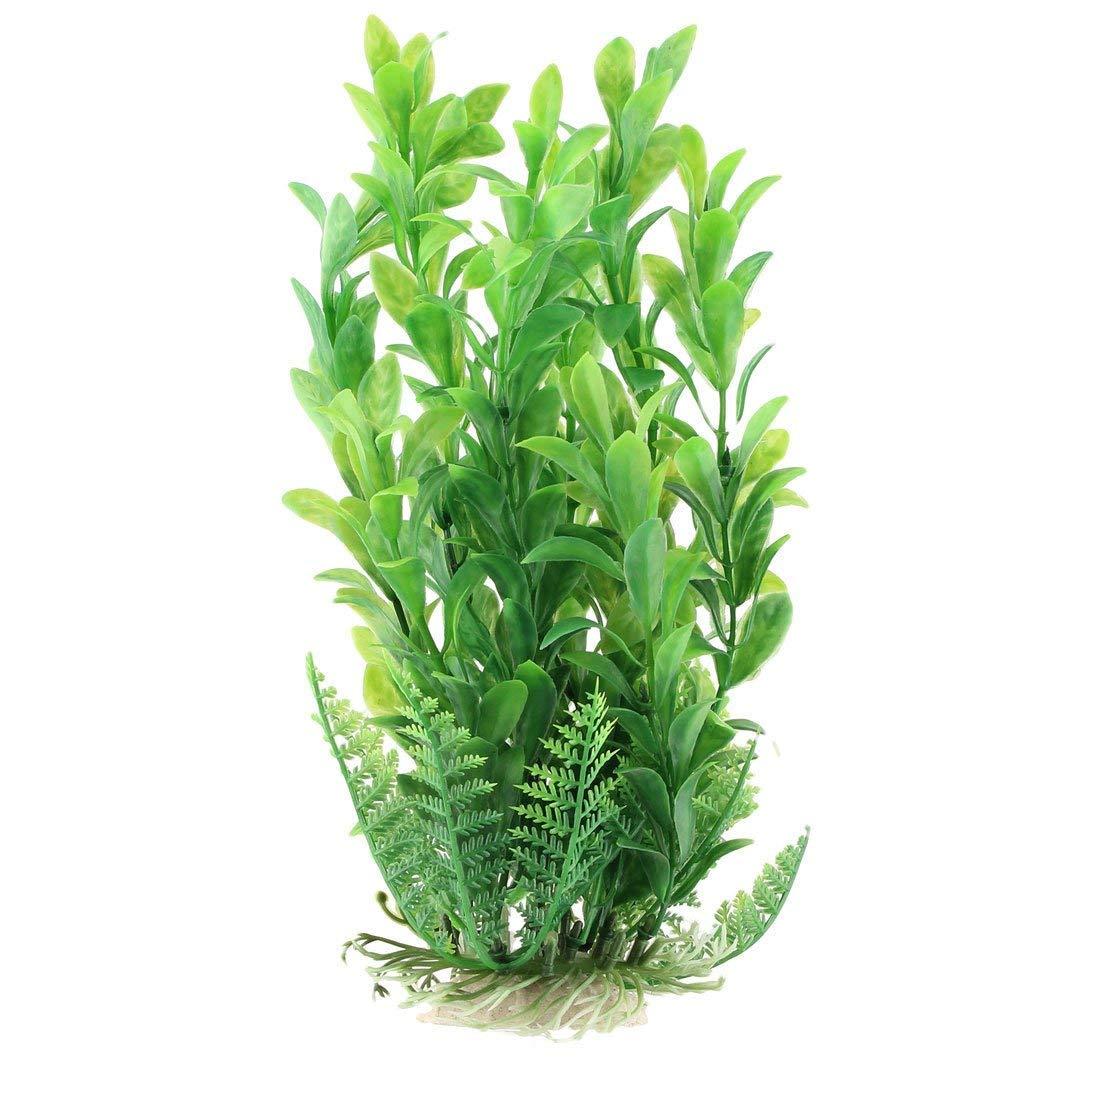 1Pc Ceramic Base Plastic Emulational Aquarium Aquatic Plant Grass Decor 8 Inch Heigth Green